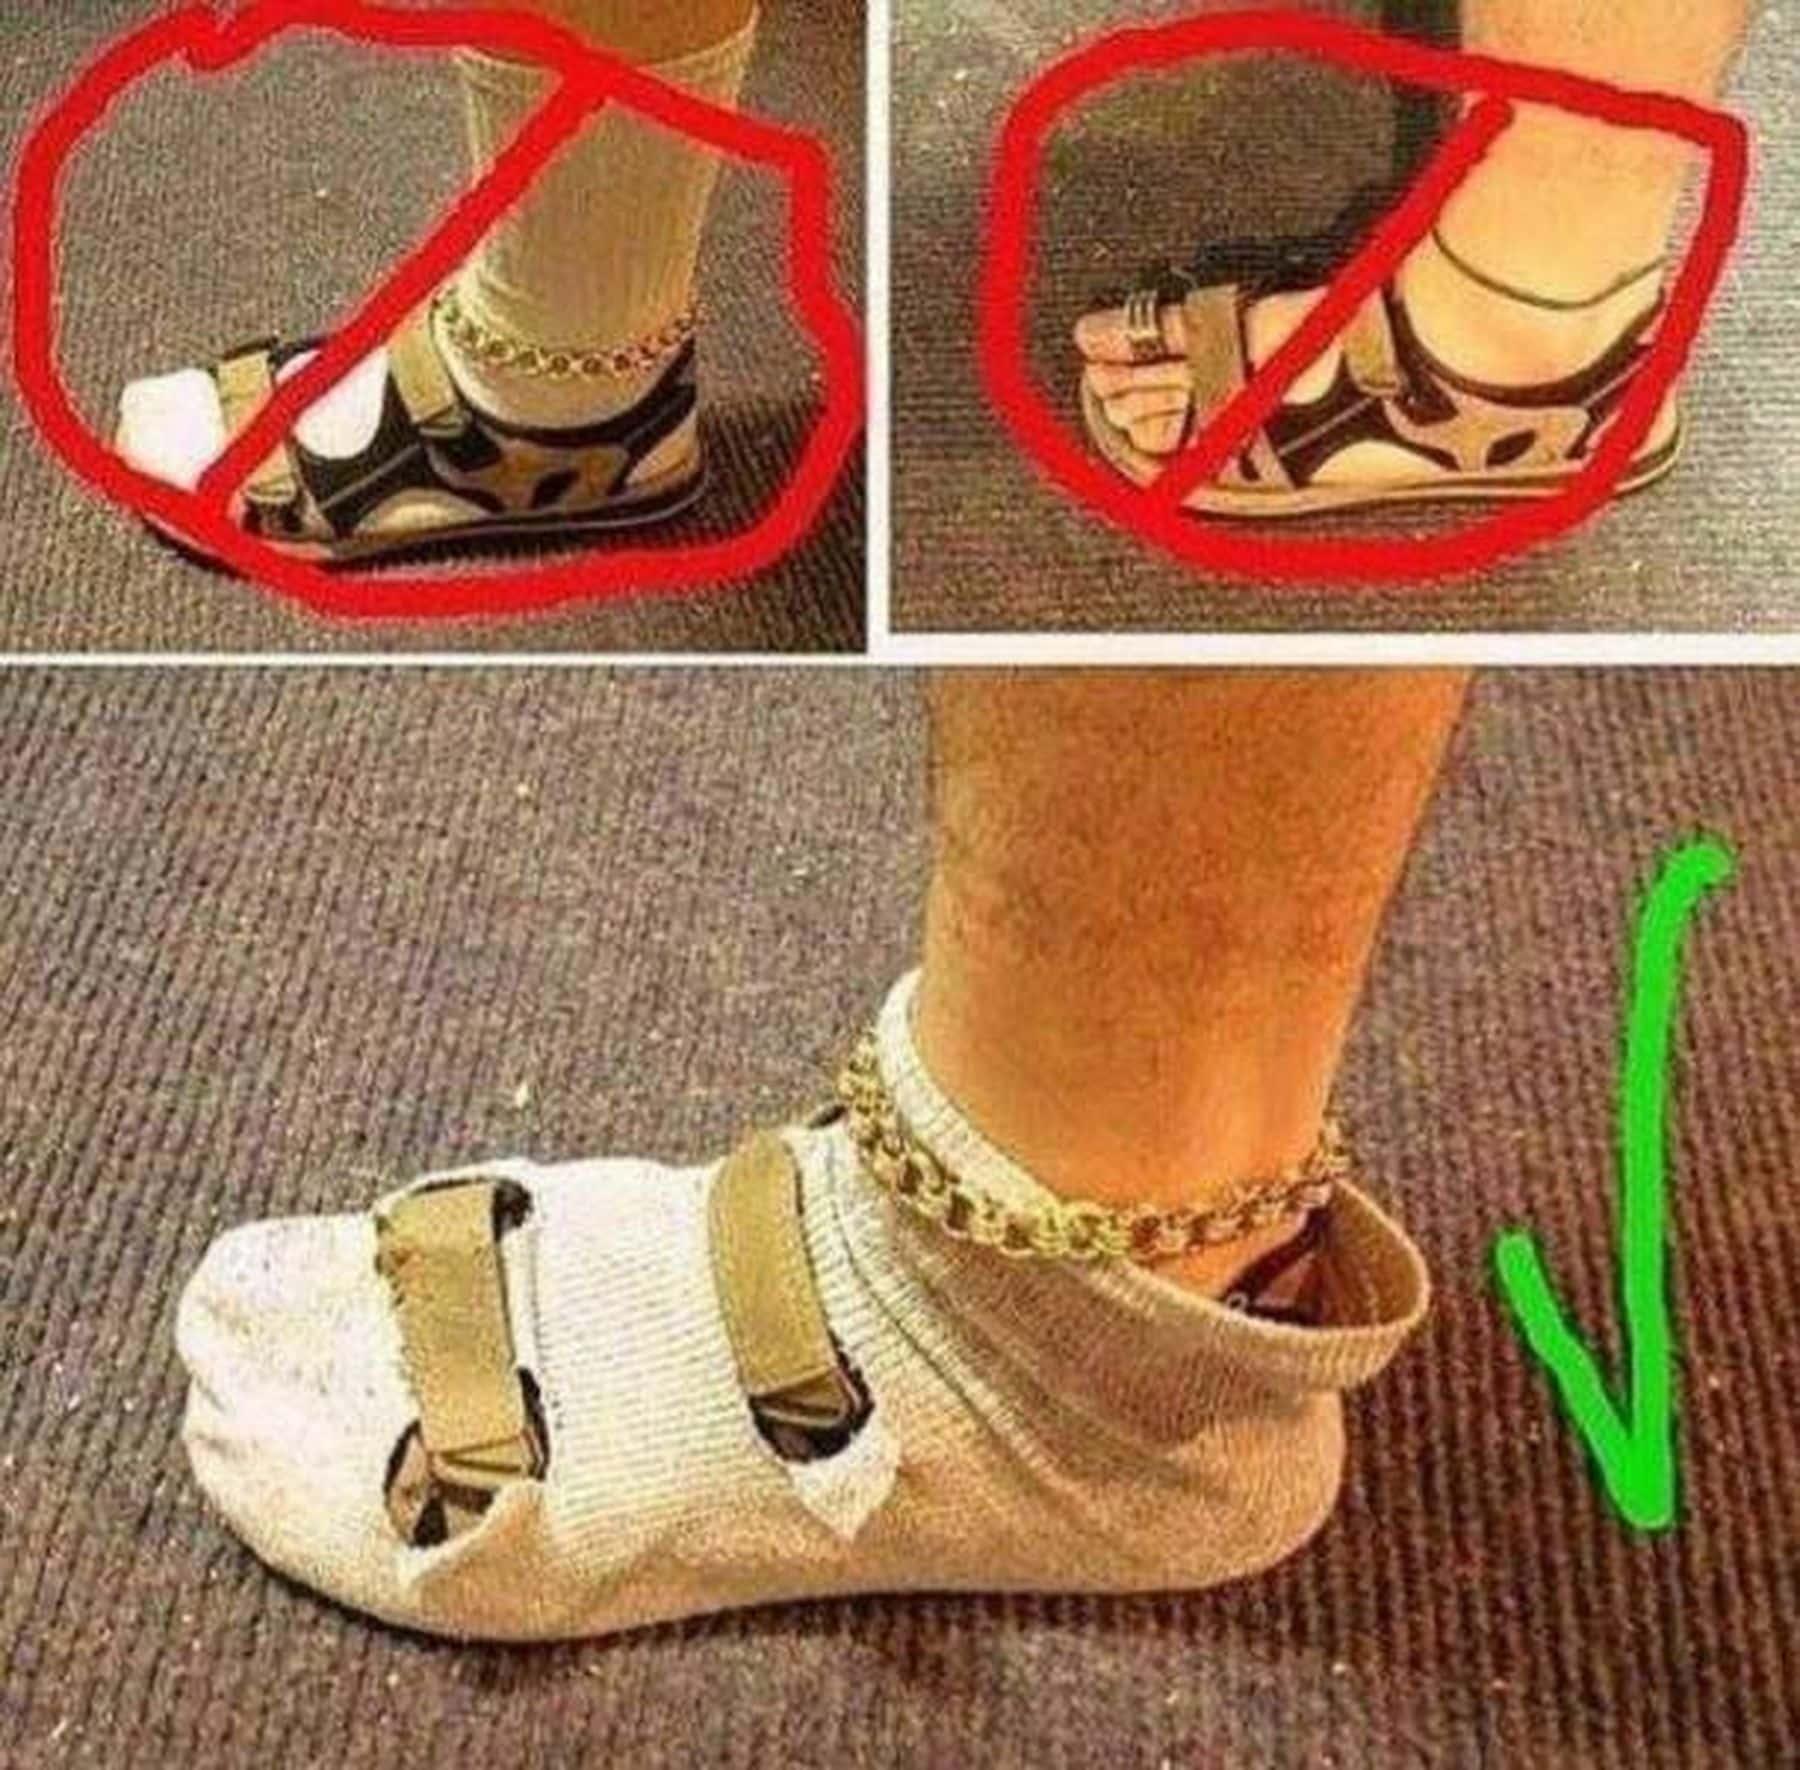 Wie man Sandalen und Socken perfekt kombiniert | Lustiges | Was is hier eigentlich los?